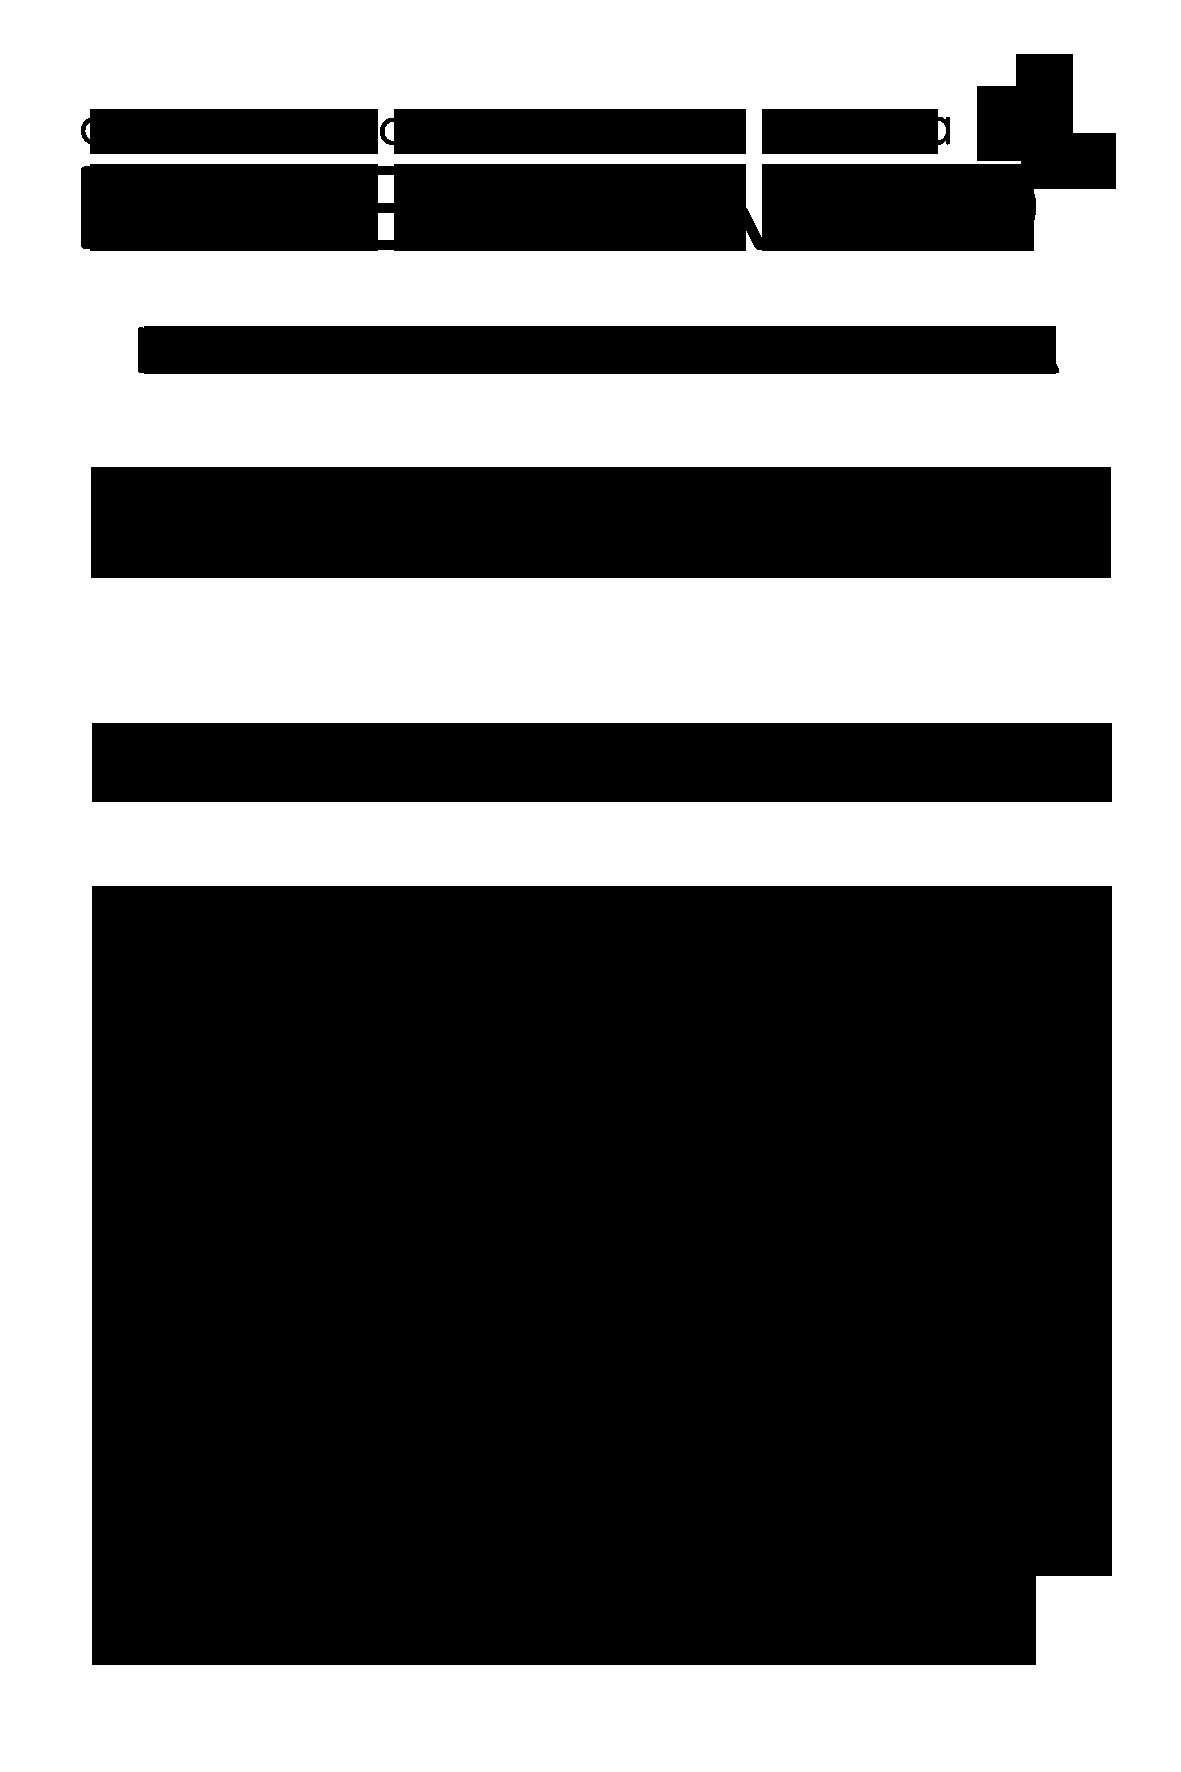 Manga Desidratada 1kg (Granel) - Esverdeando